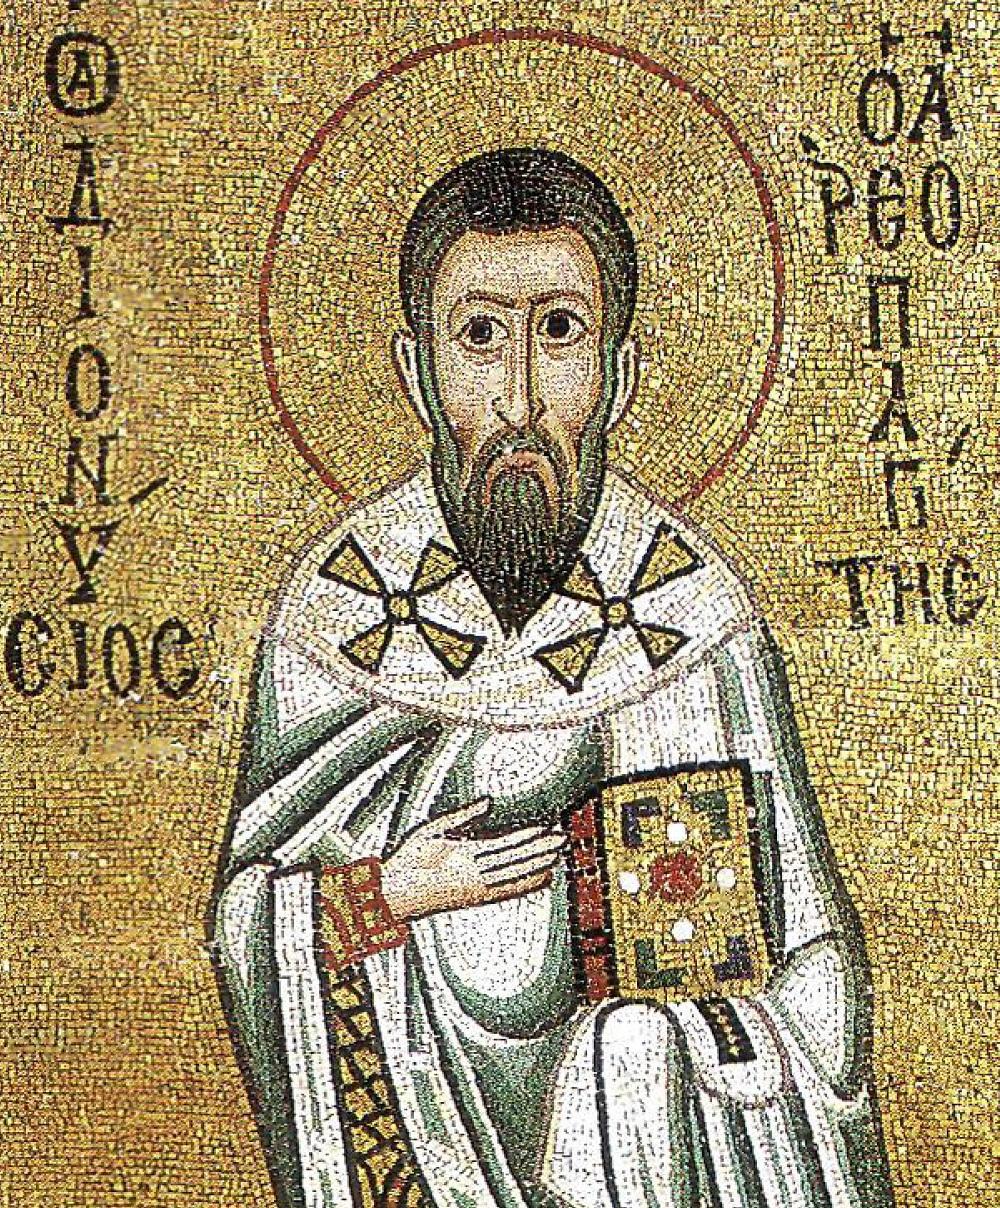 Byzantine mosaic of Dionysius the Areopagite | C11, Hosios Loukas Monastery, Boeotia |  Image Source